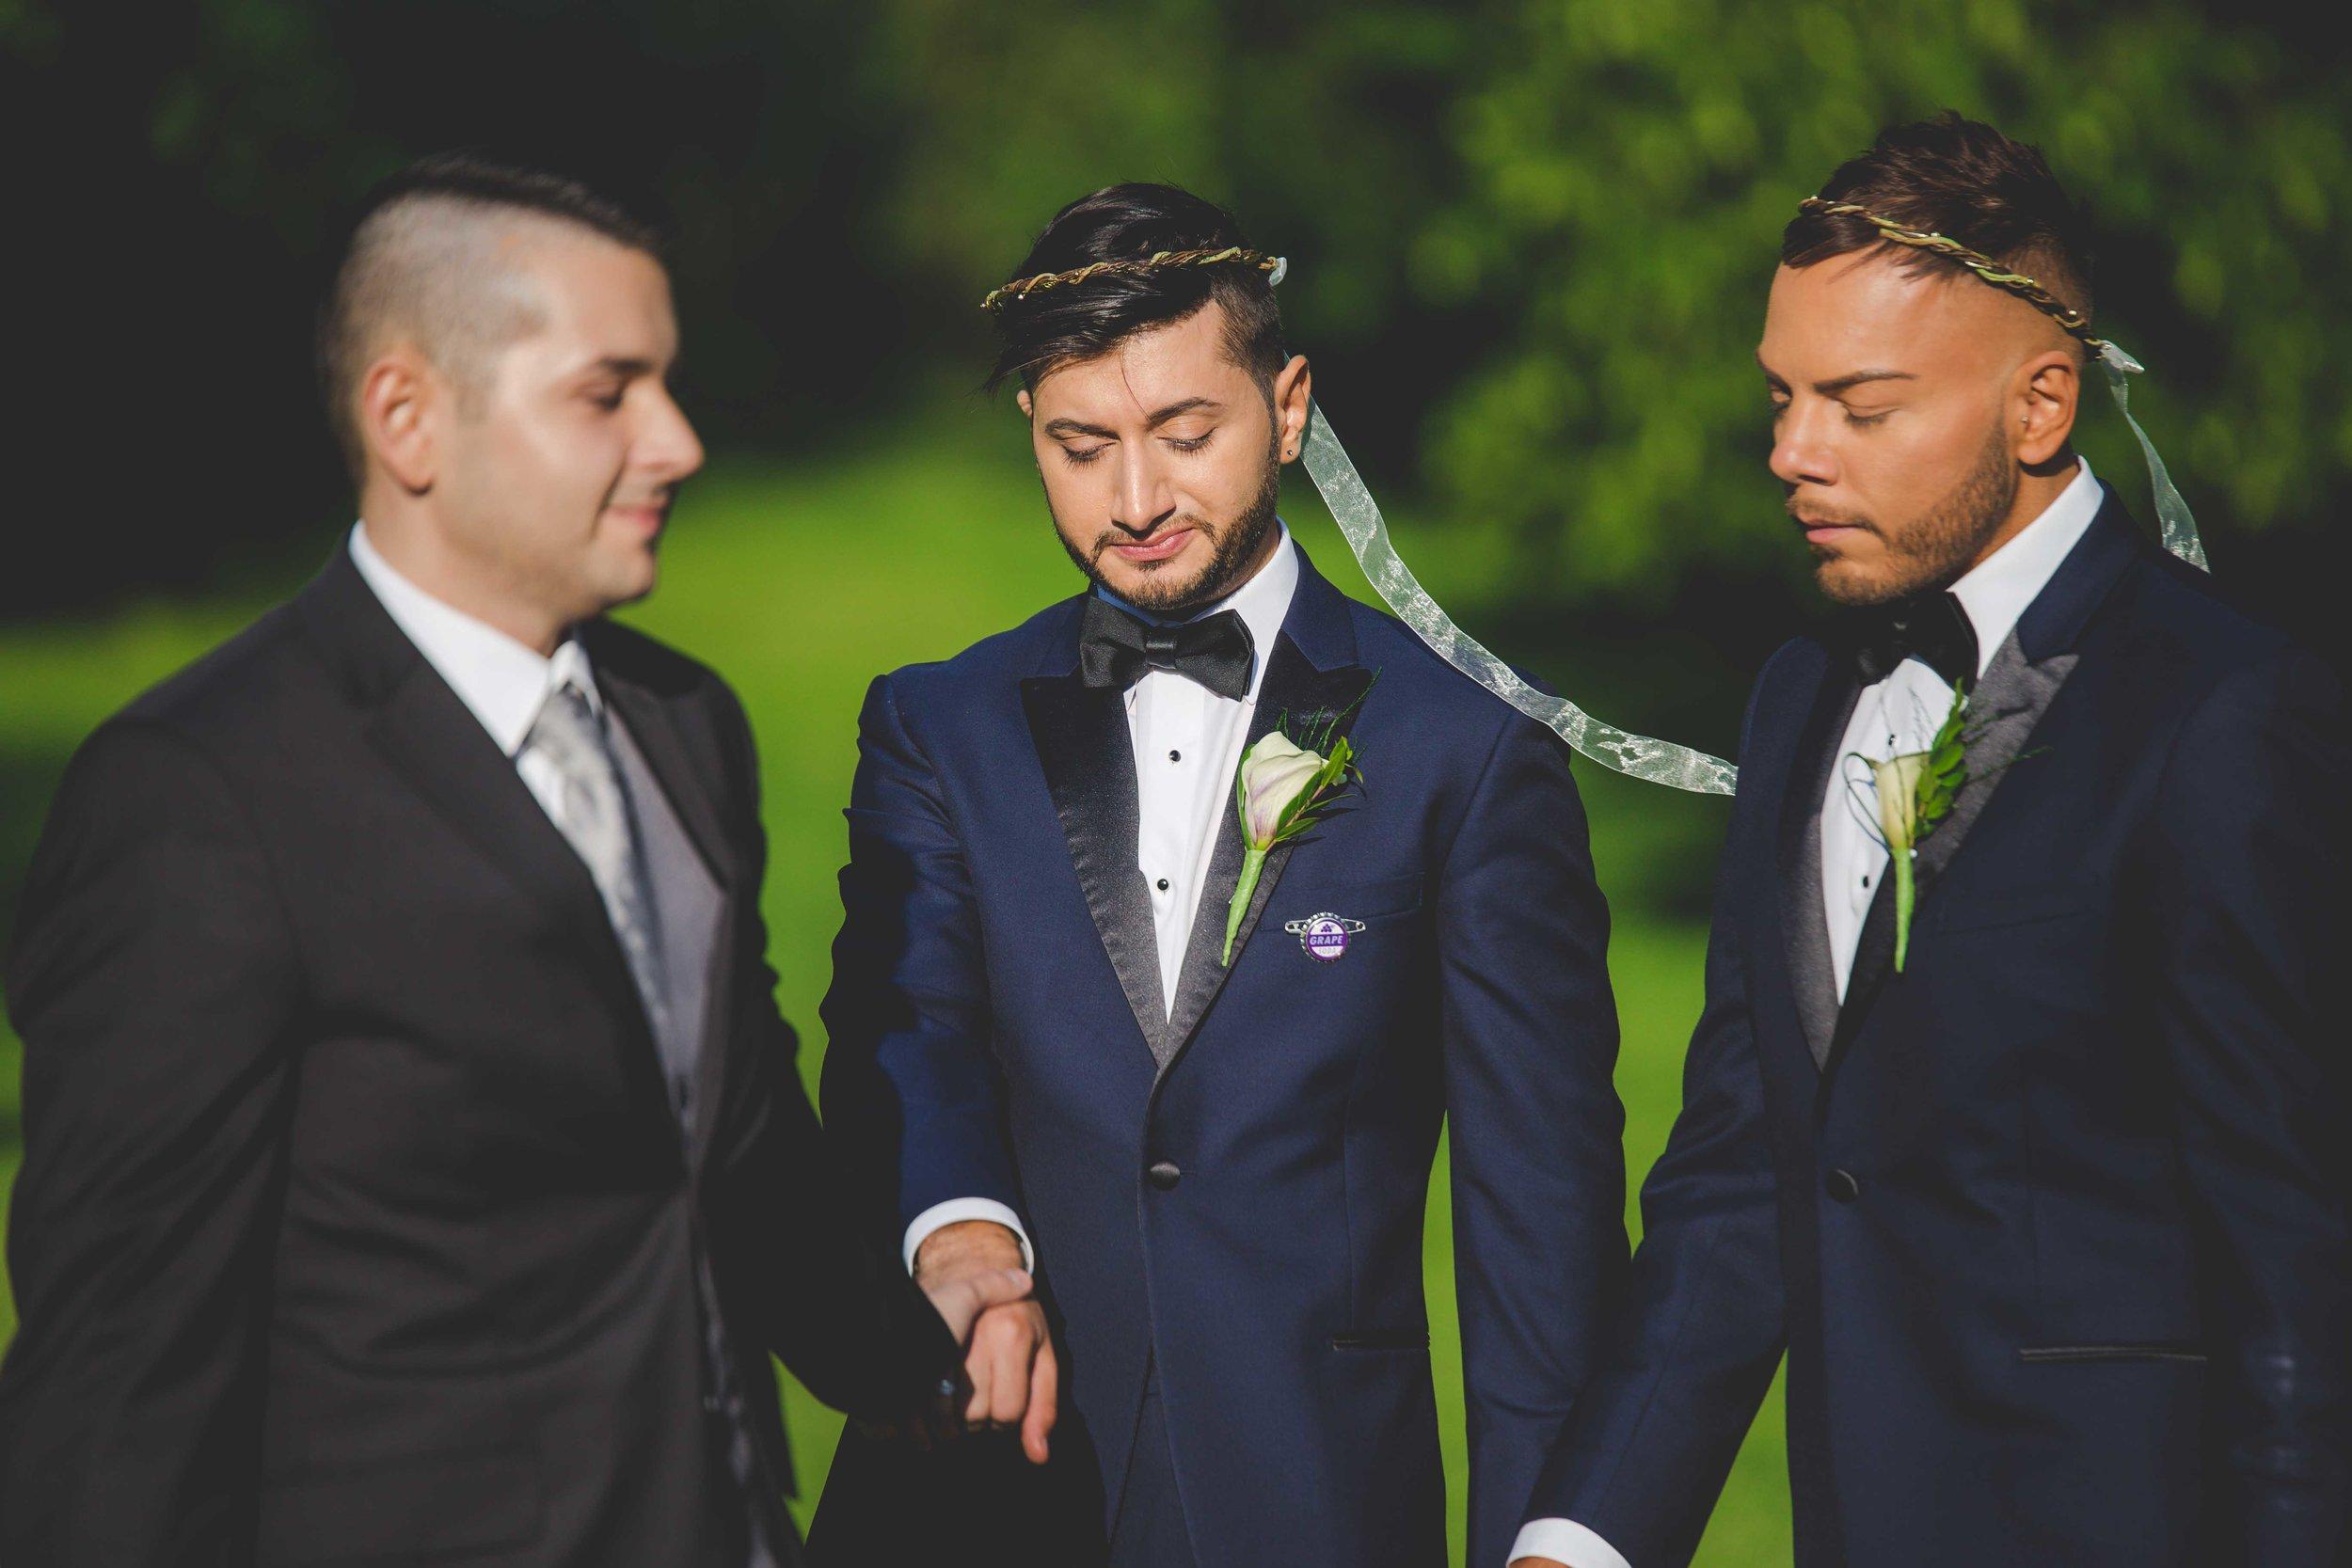 lyndhurst-mansion-amazing-gay-wedding-39.jpg